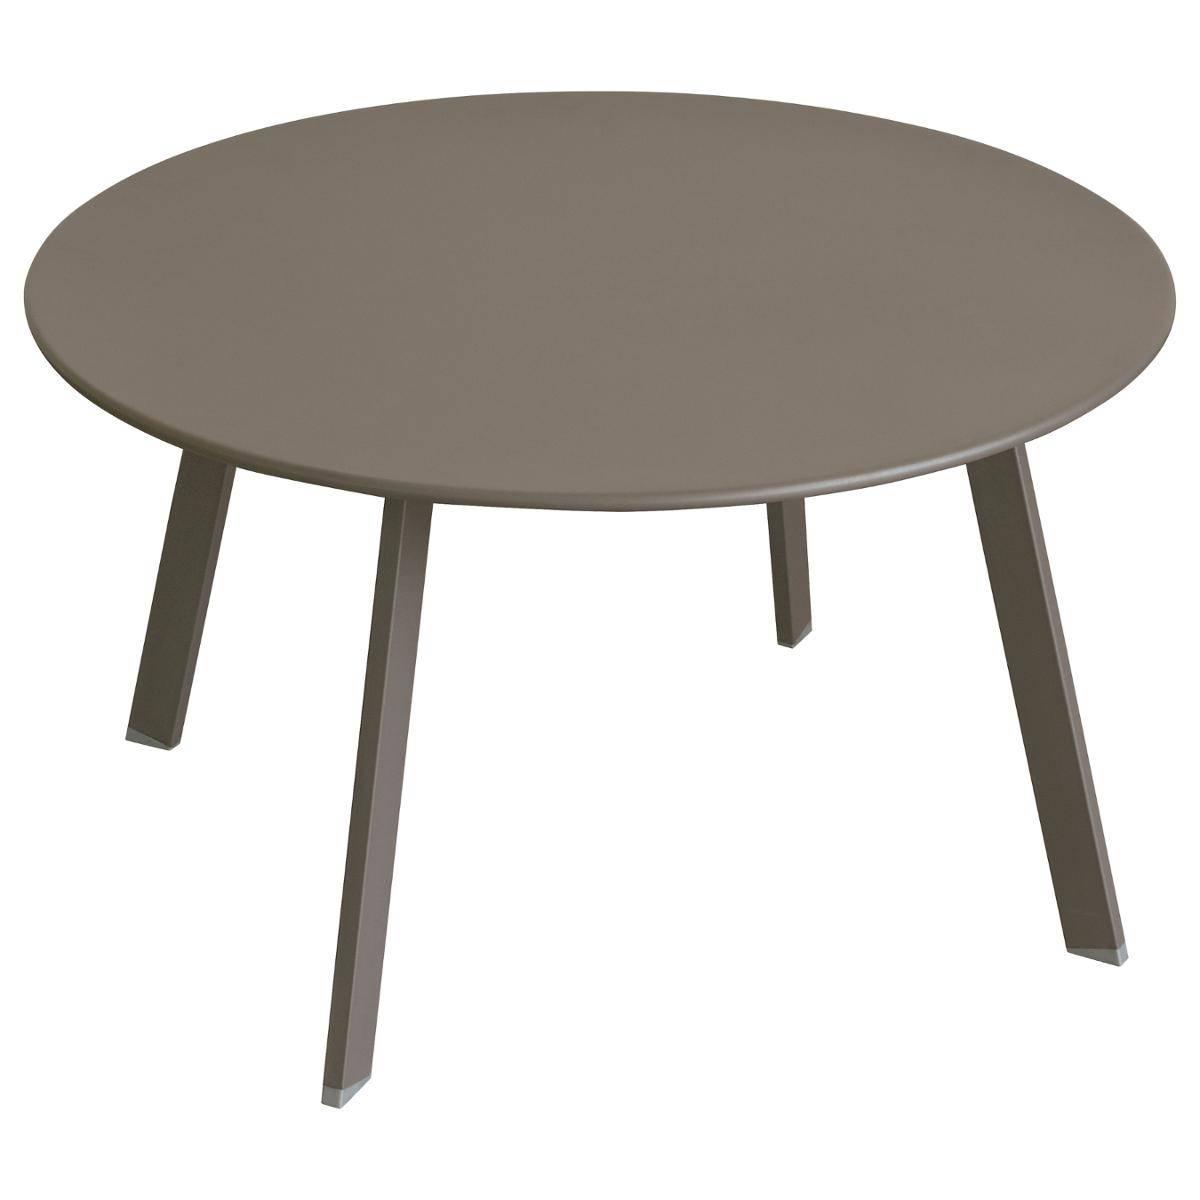 Hespéride Table d'appoint de jardin ronde Saona Tonka 70 x 40 cm - Acier traité époxy